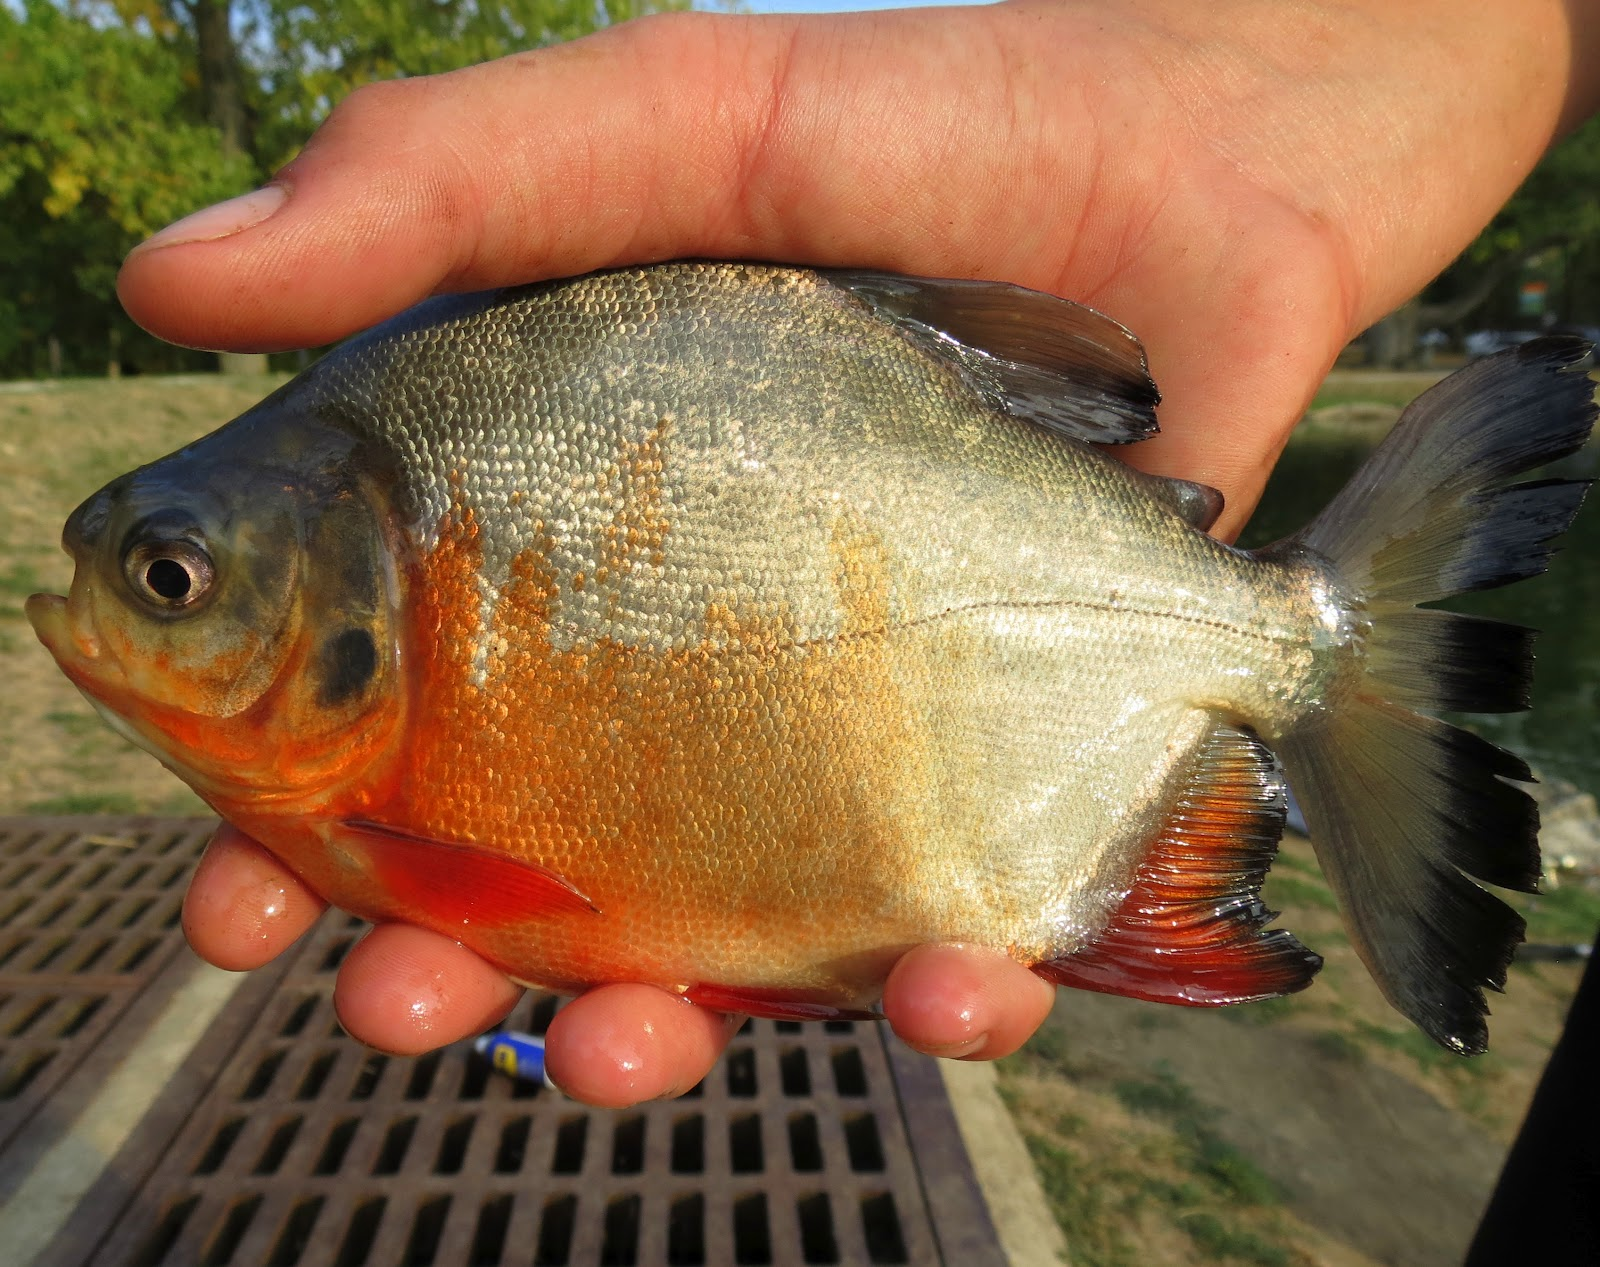 how to prepare caught fish